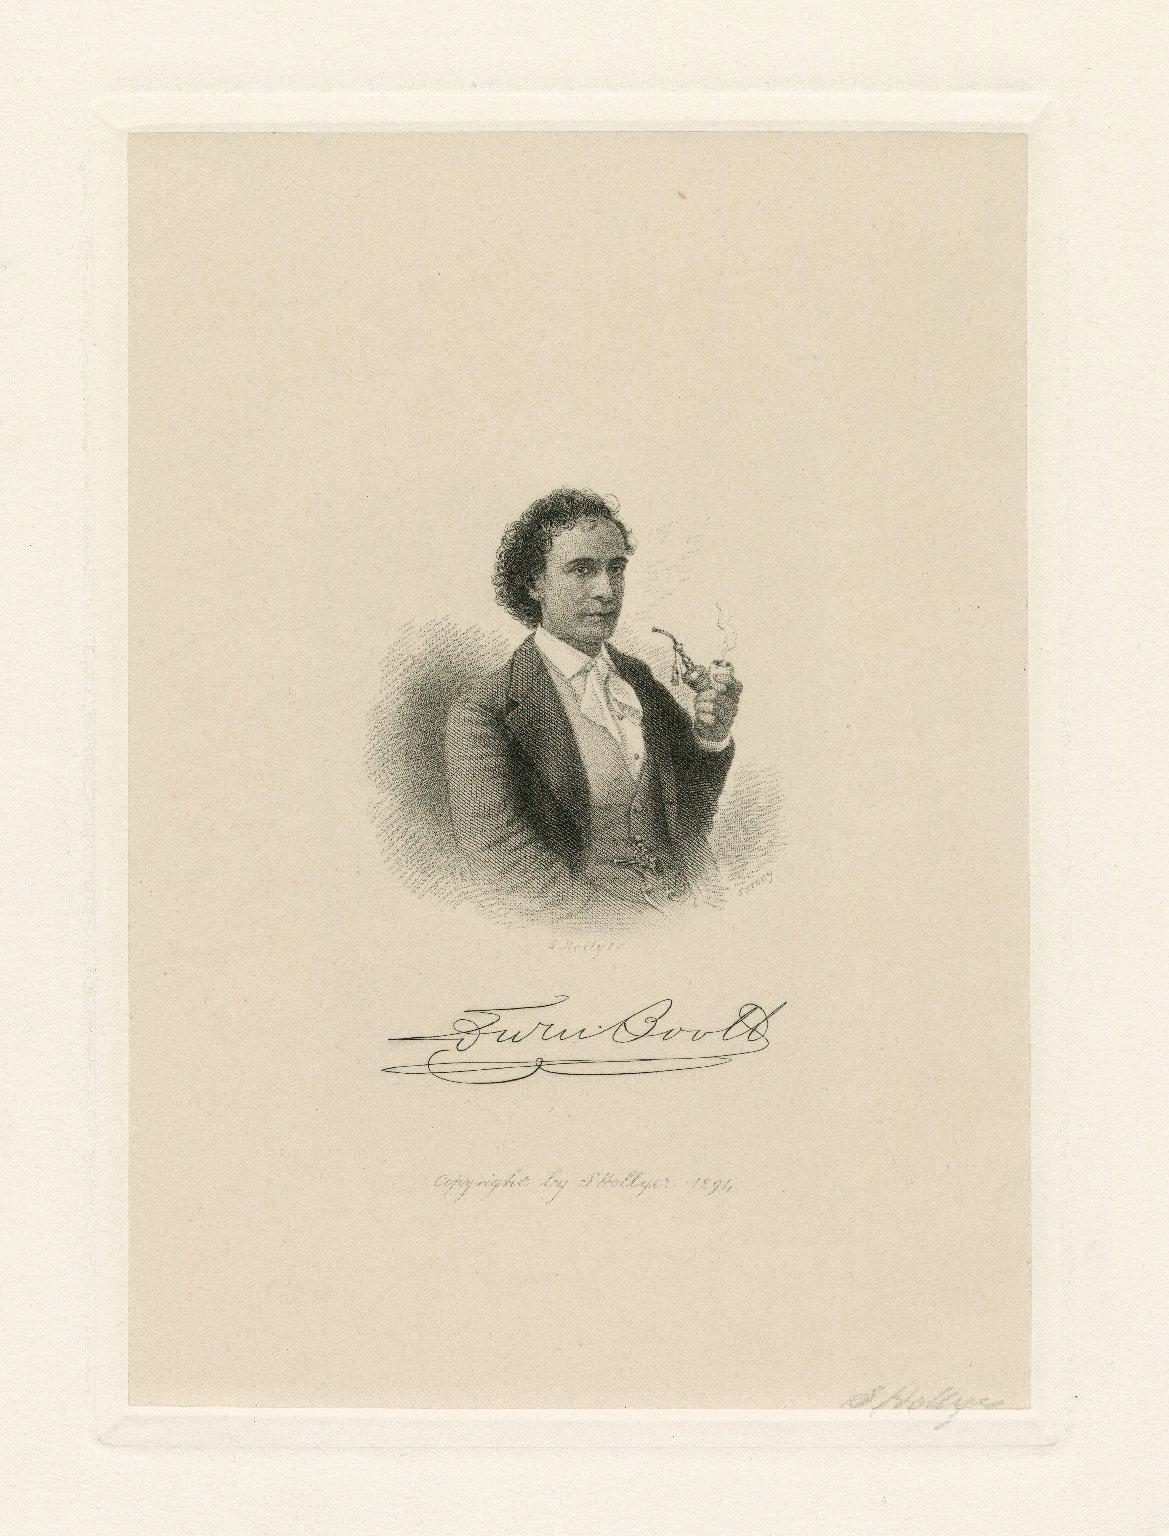 Edwin Booth [graphic] / S. Hollyer ; Sarony [photographer].